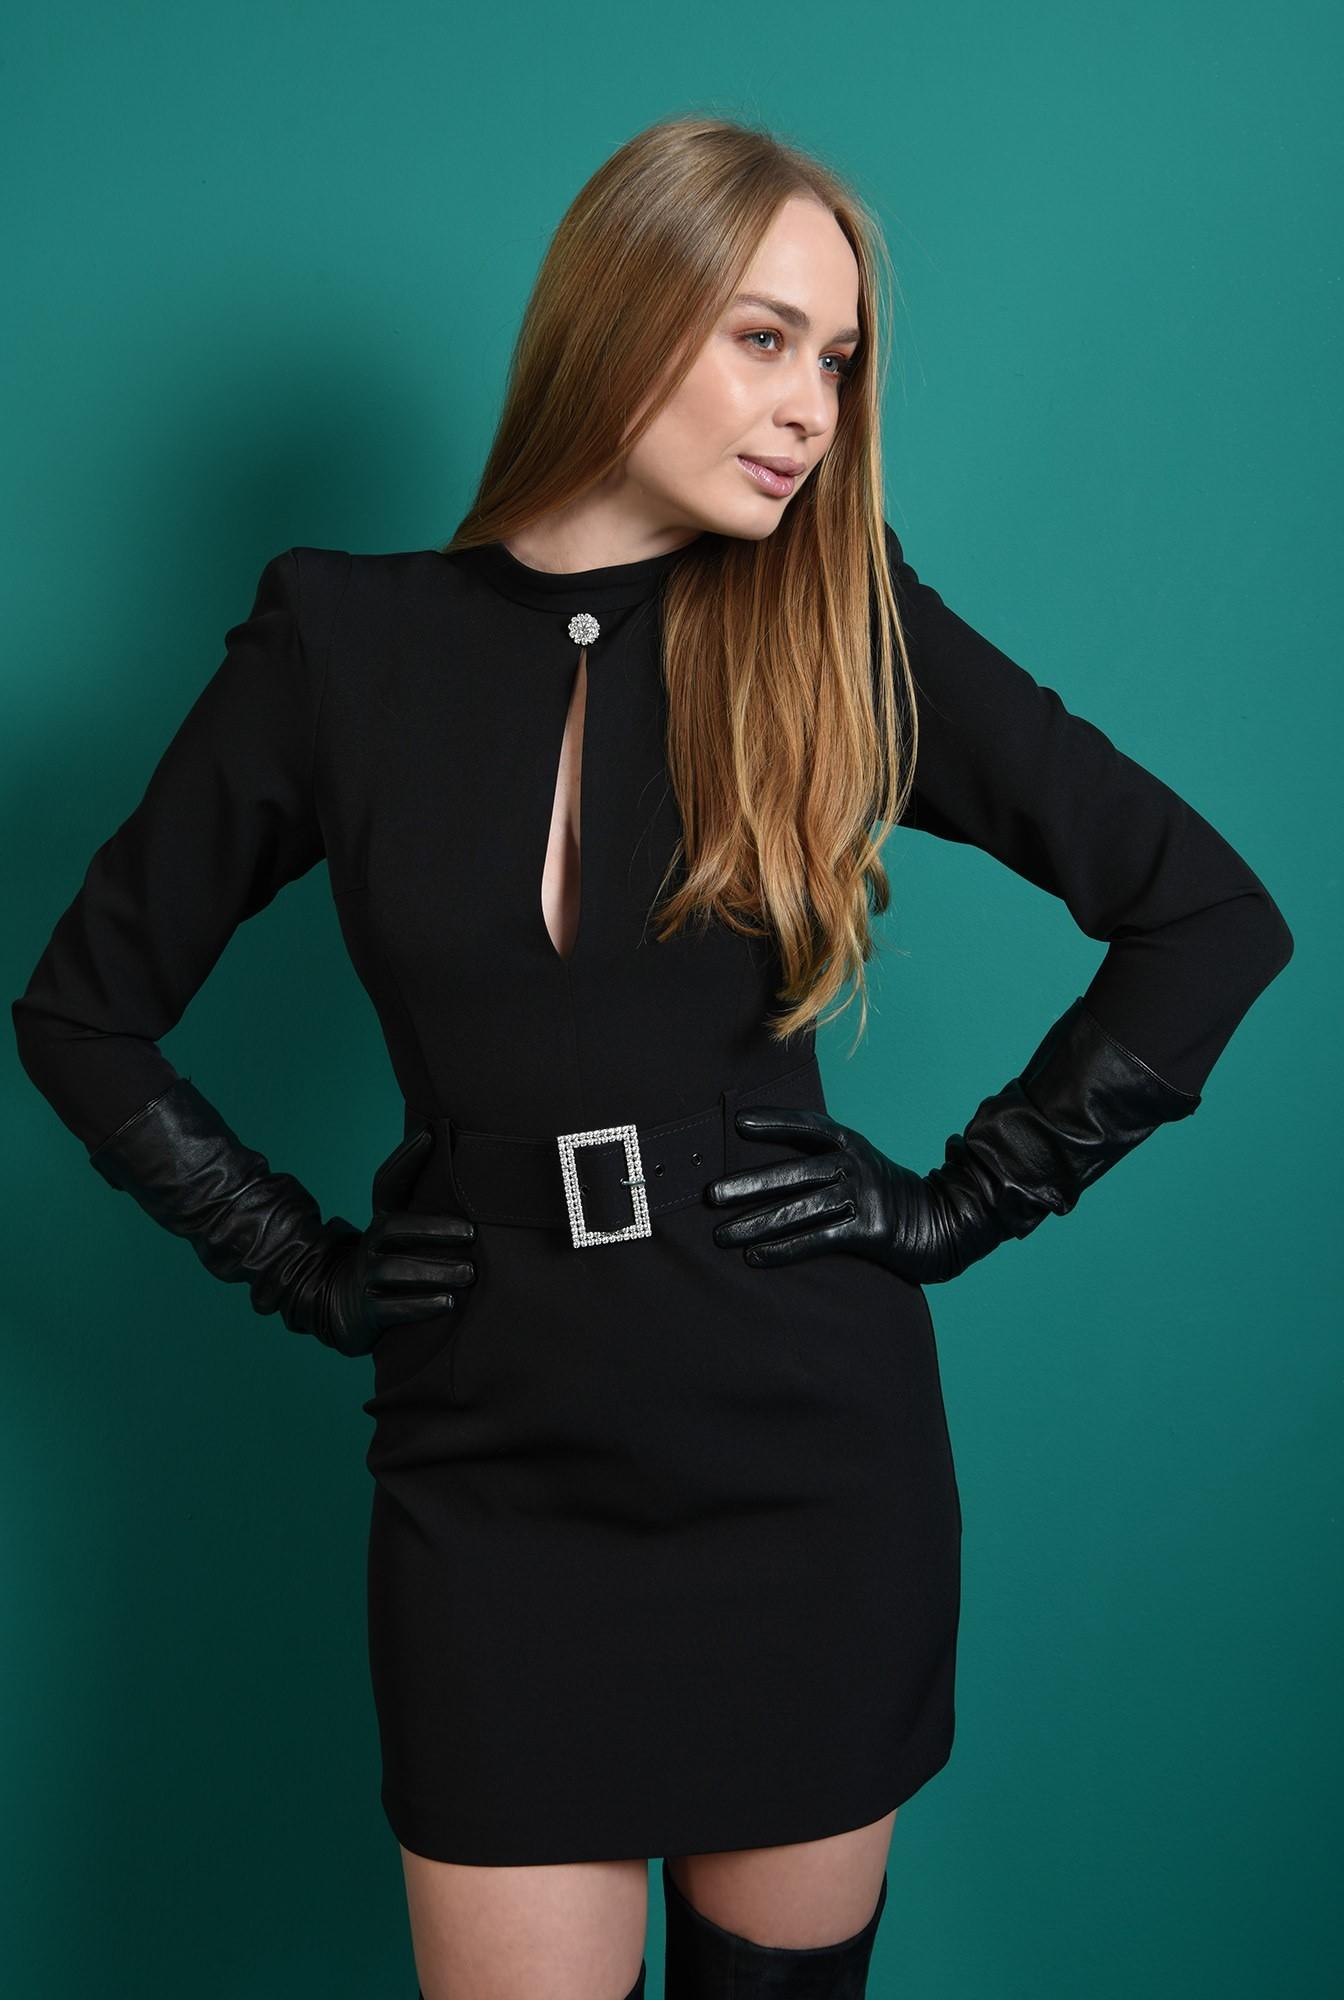 0 - rochie eleganta, neagra, cu centura din strasuri